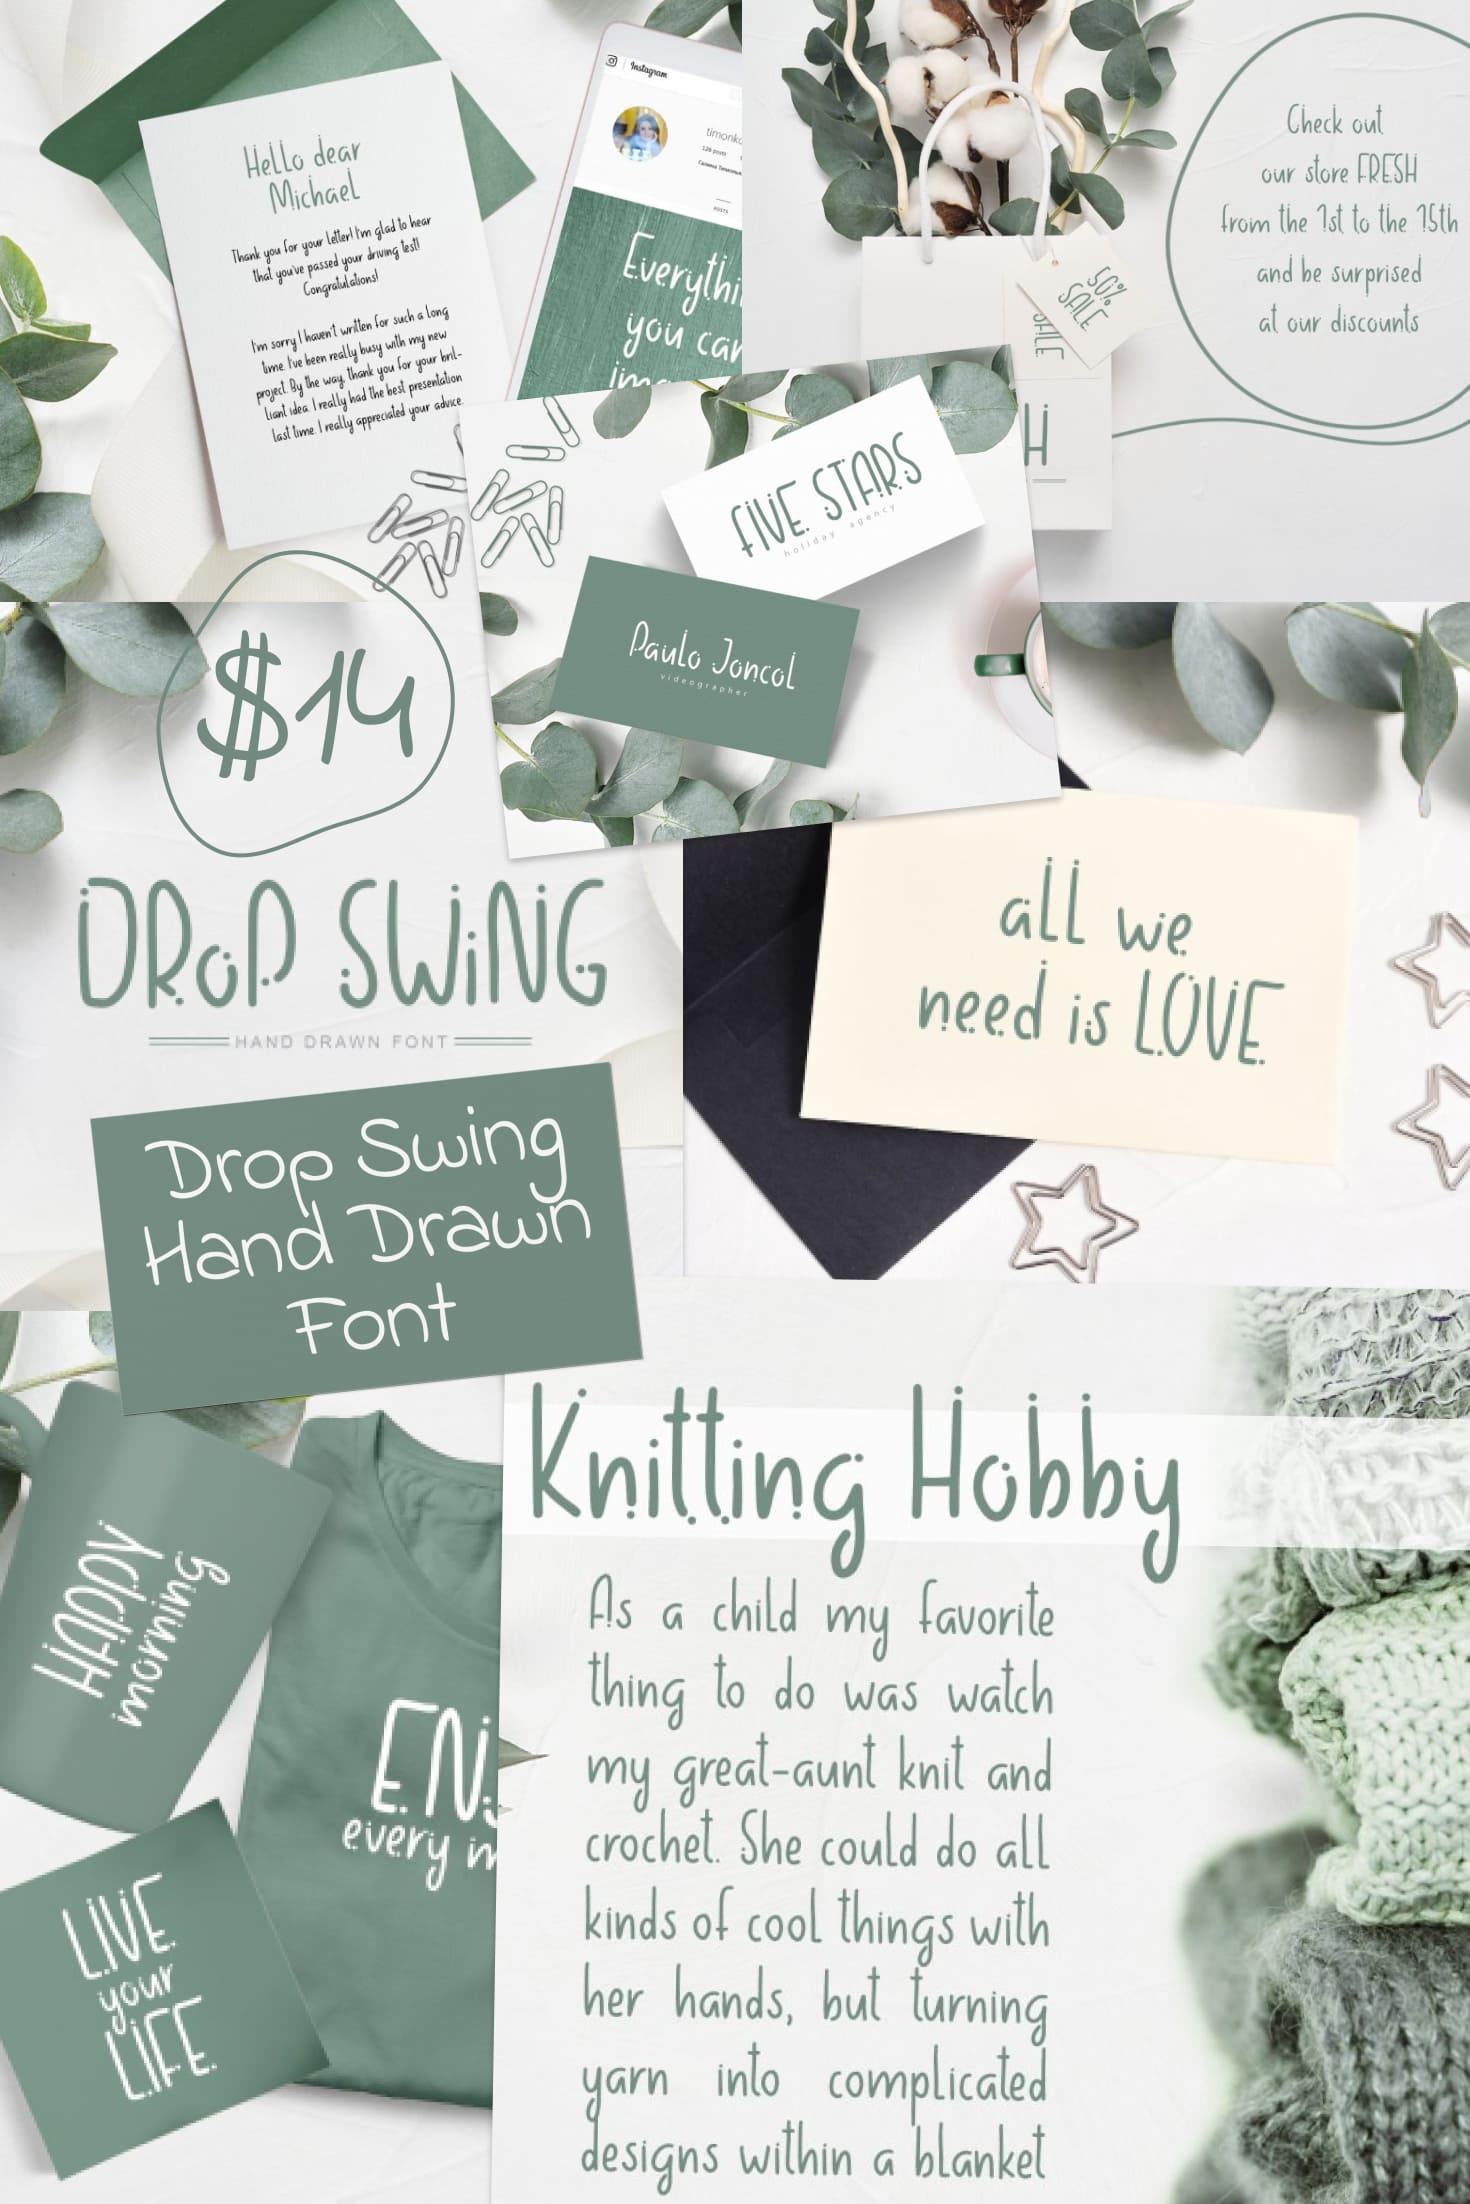 Pinterest Image: Drop Swing Hand Drawn Font - $14.